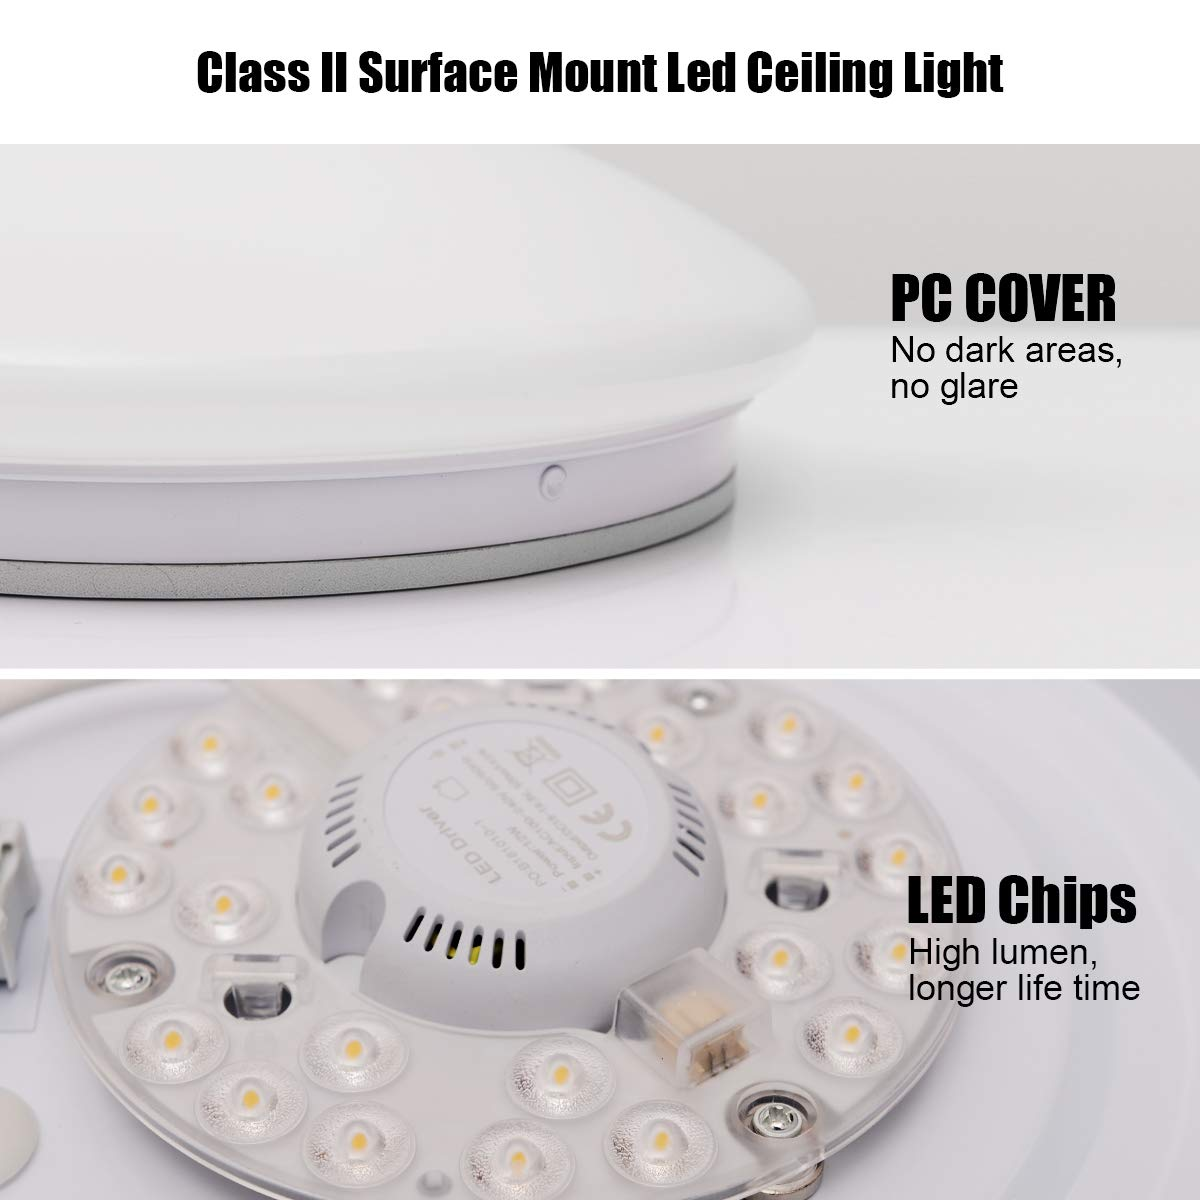 10 inch Led Ceiling Light Fixture 3000K Soft White Lighting,100W Equivalent,1200 LM,Mushroom Shape,12W Flush Mount Led Ceiling Lights for Home, Foyers, Restroom, Closet, Attic, Basement, Garage